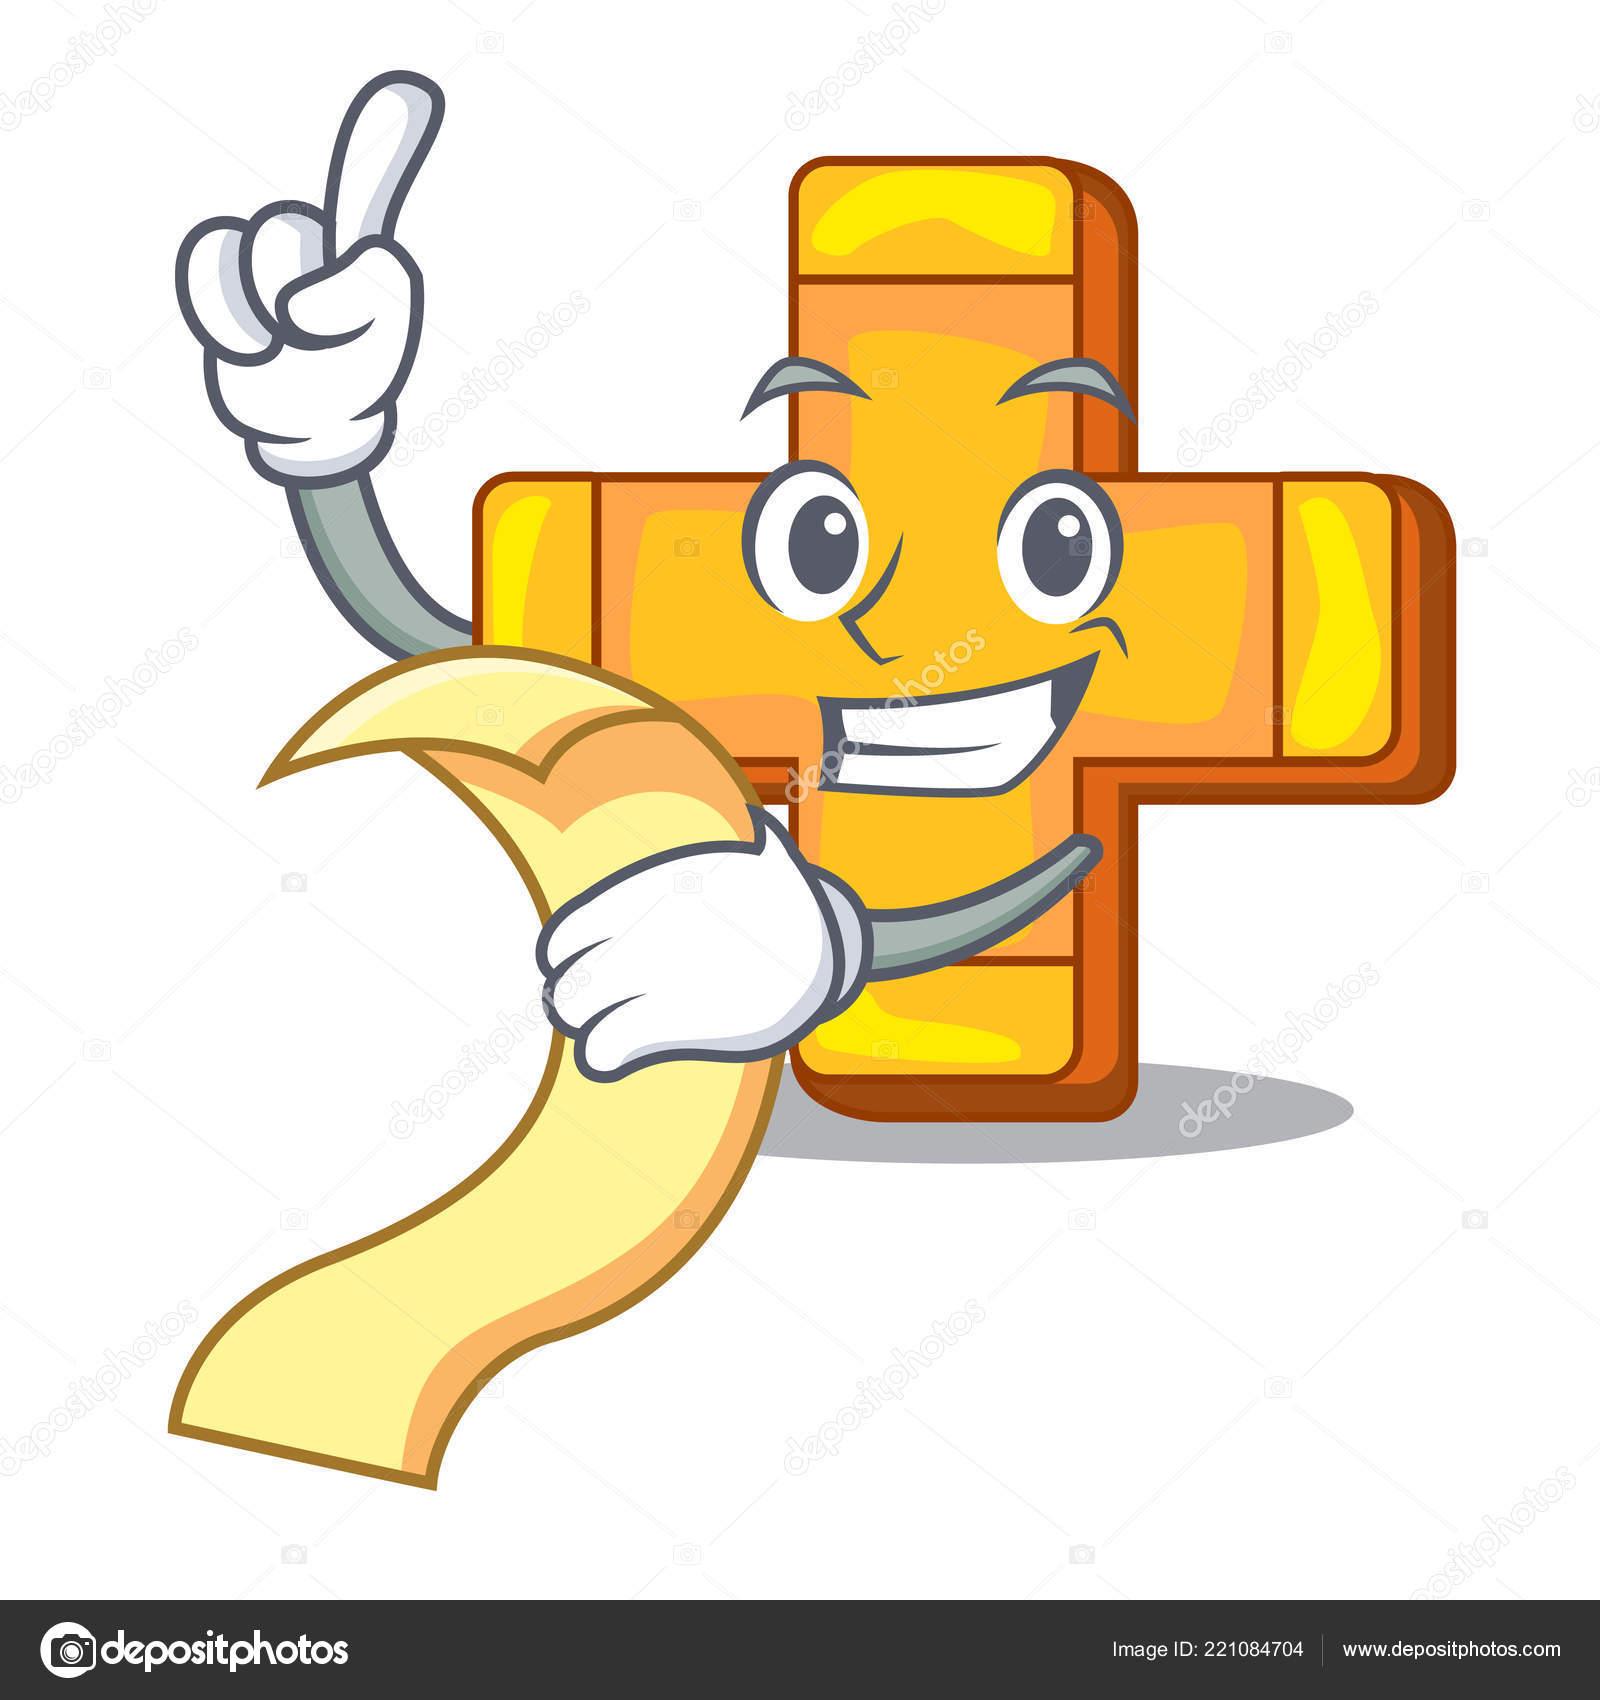 With Menu Retro Plus Sign Addition Symbol Cartoon Stock Vector